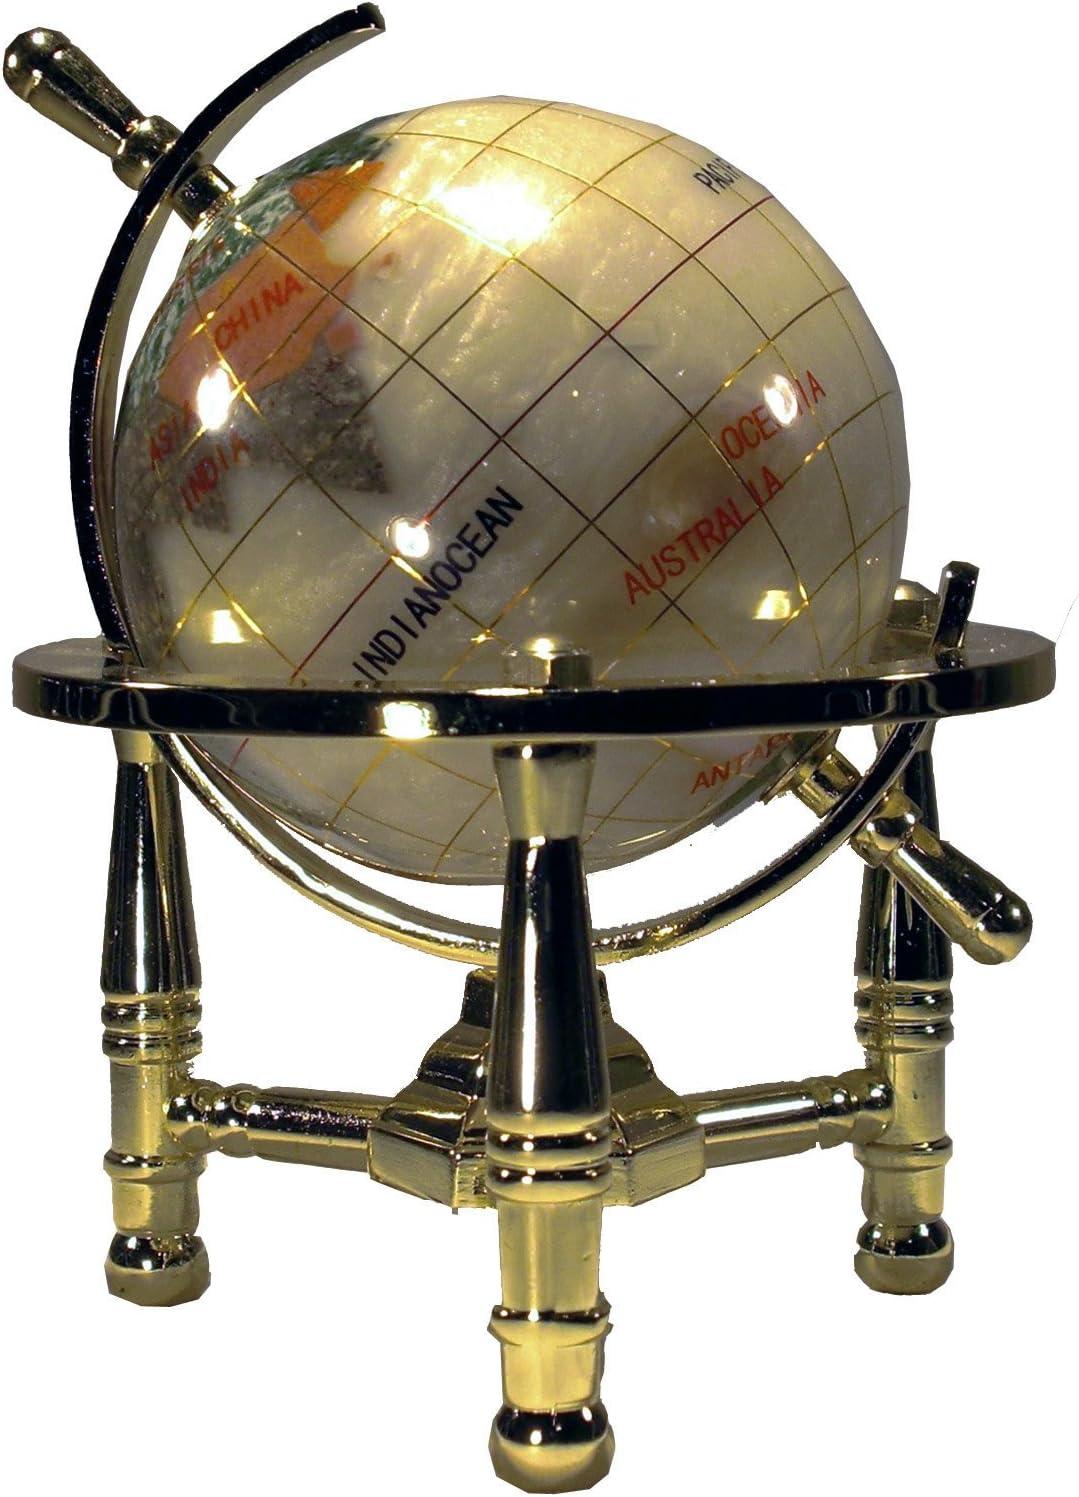 Unique Art 6-Inch Tall Pearl Swirl Ocean Mini Table Top Gemstone World Globe with Gold Tripod